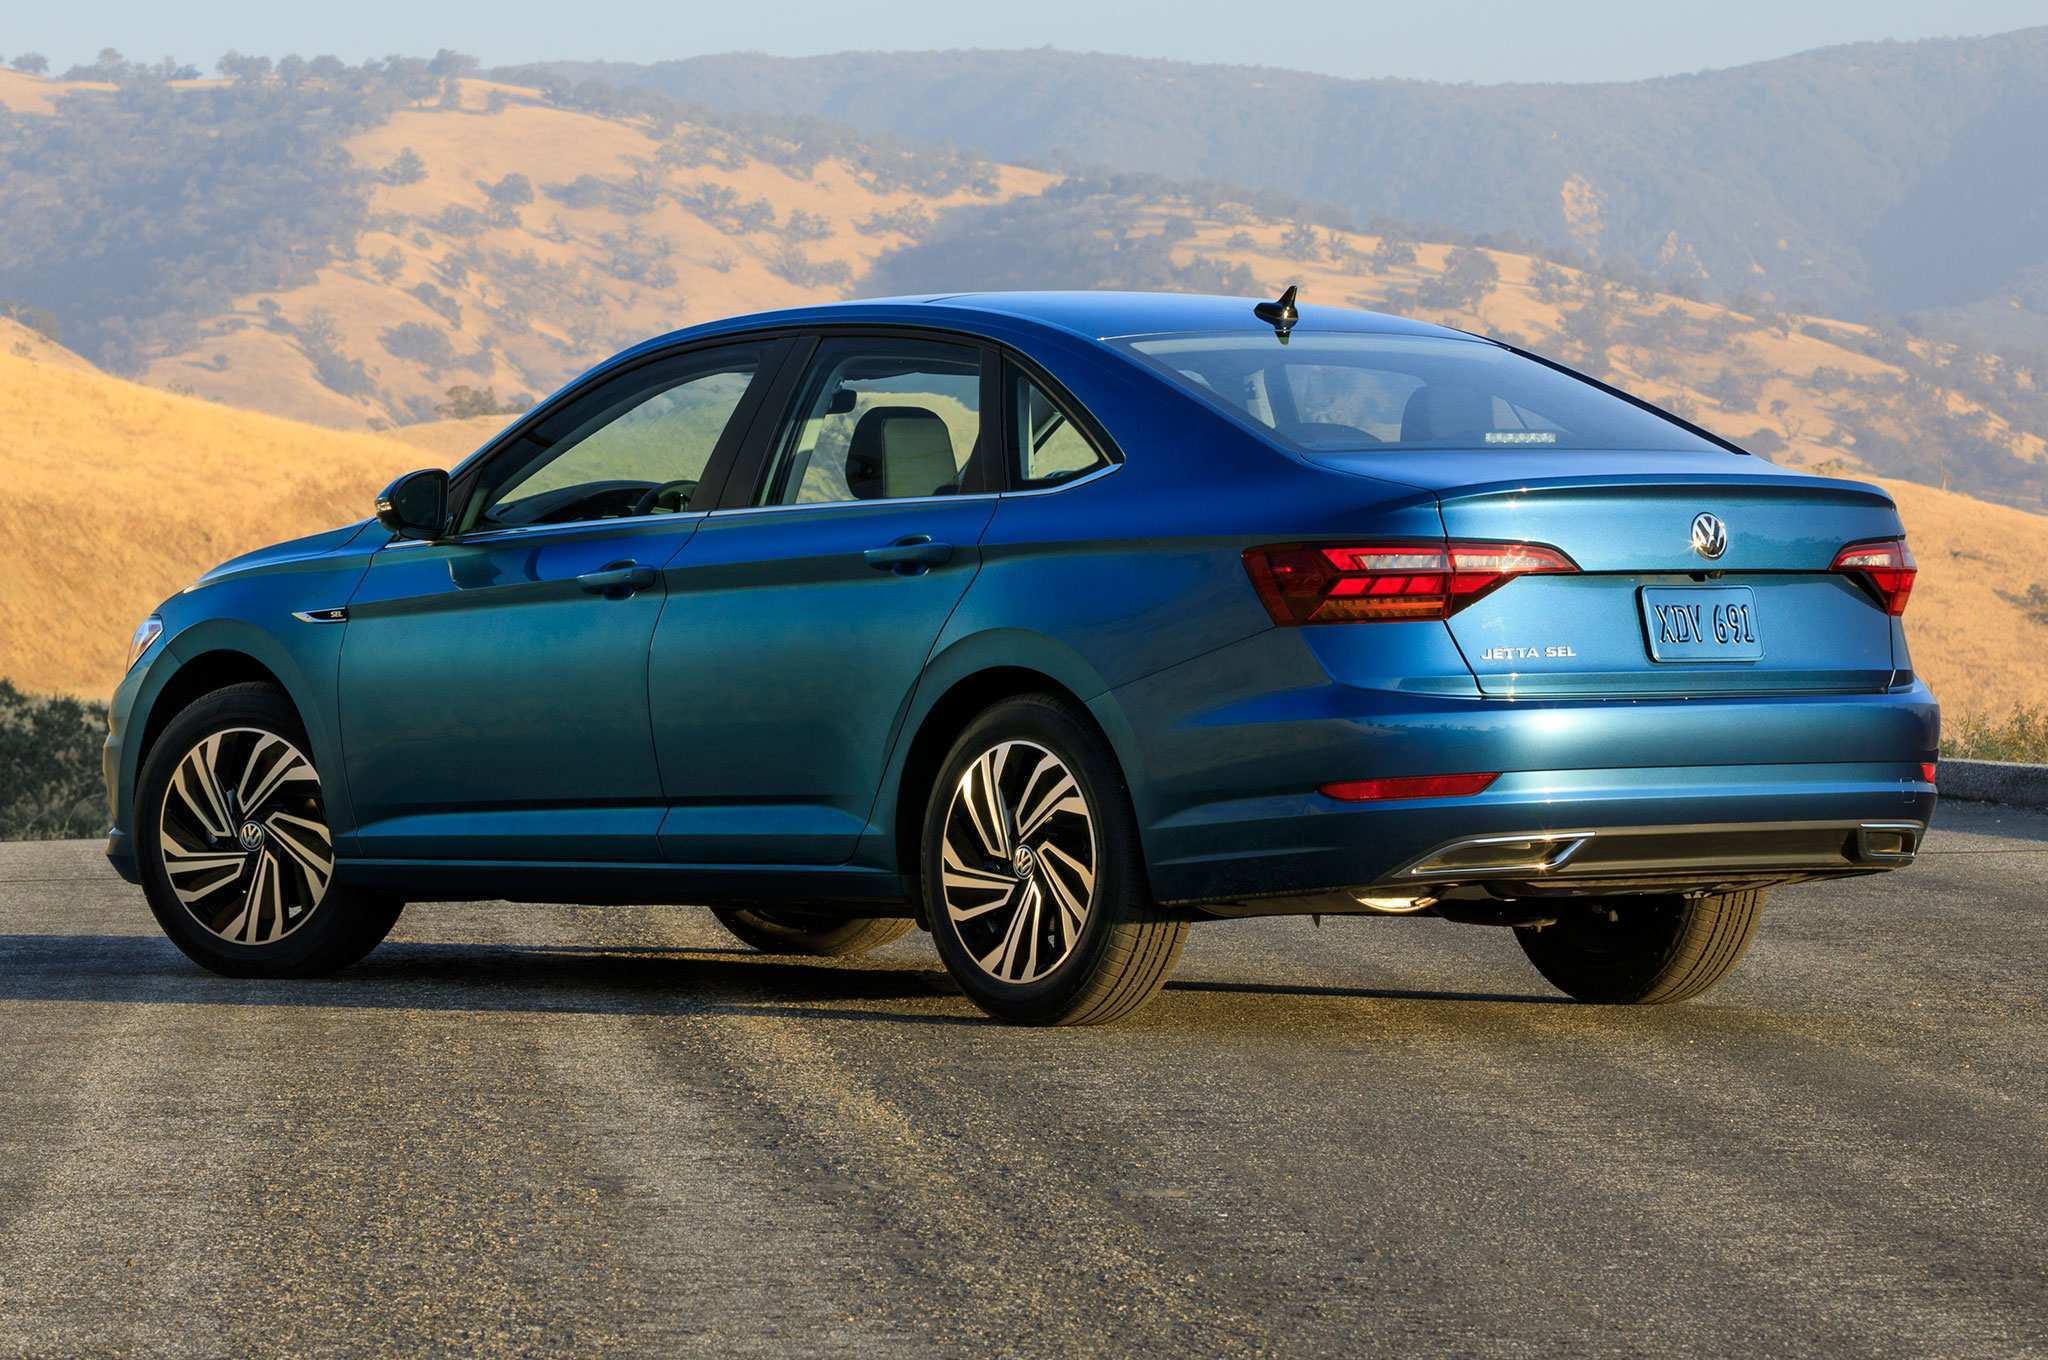 83 Best Review 2019 Volkswagen Jetta Horsepower Price by 2019 Volkswagen Jetta Horsepower